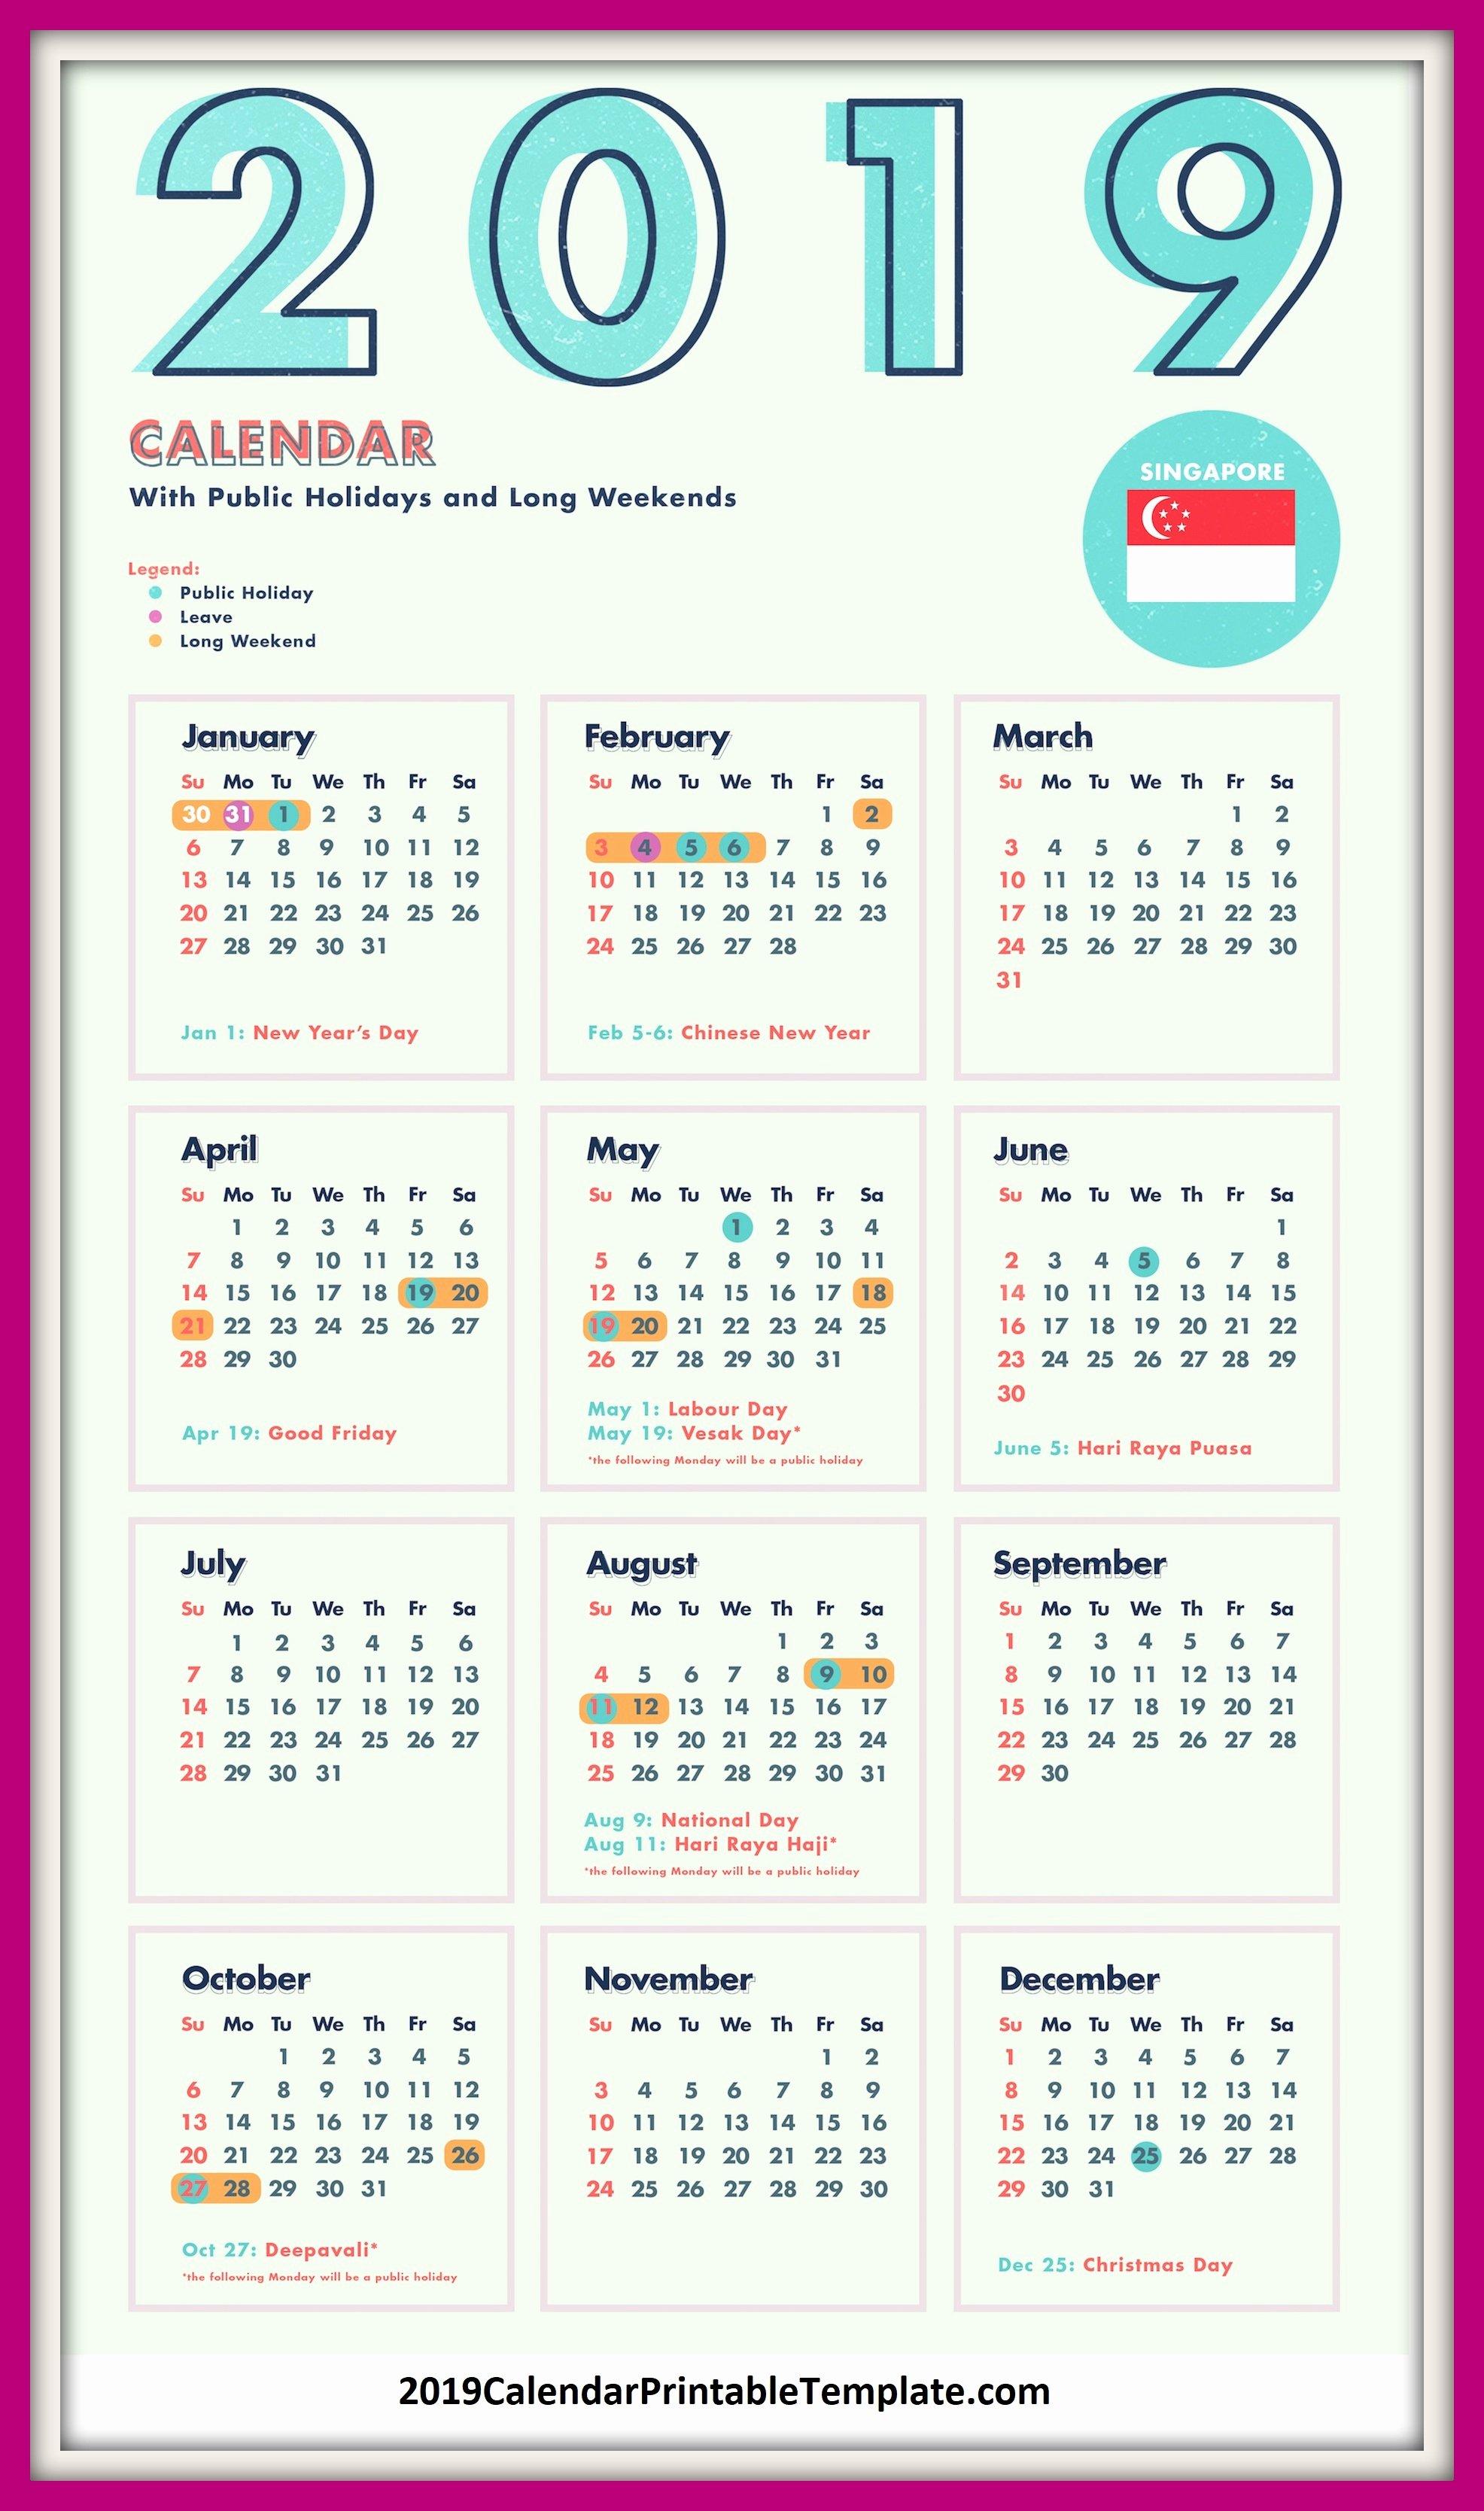 Golf Practice Schedule Template Awesome 2019 Calendar Singapore 2019 Calendar Printable Template